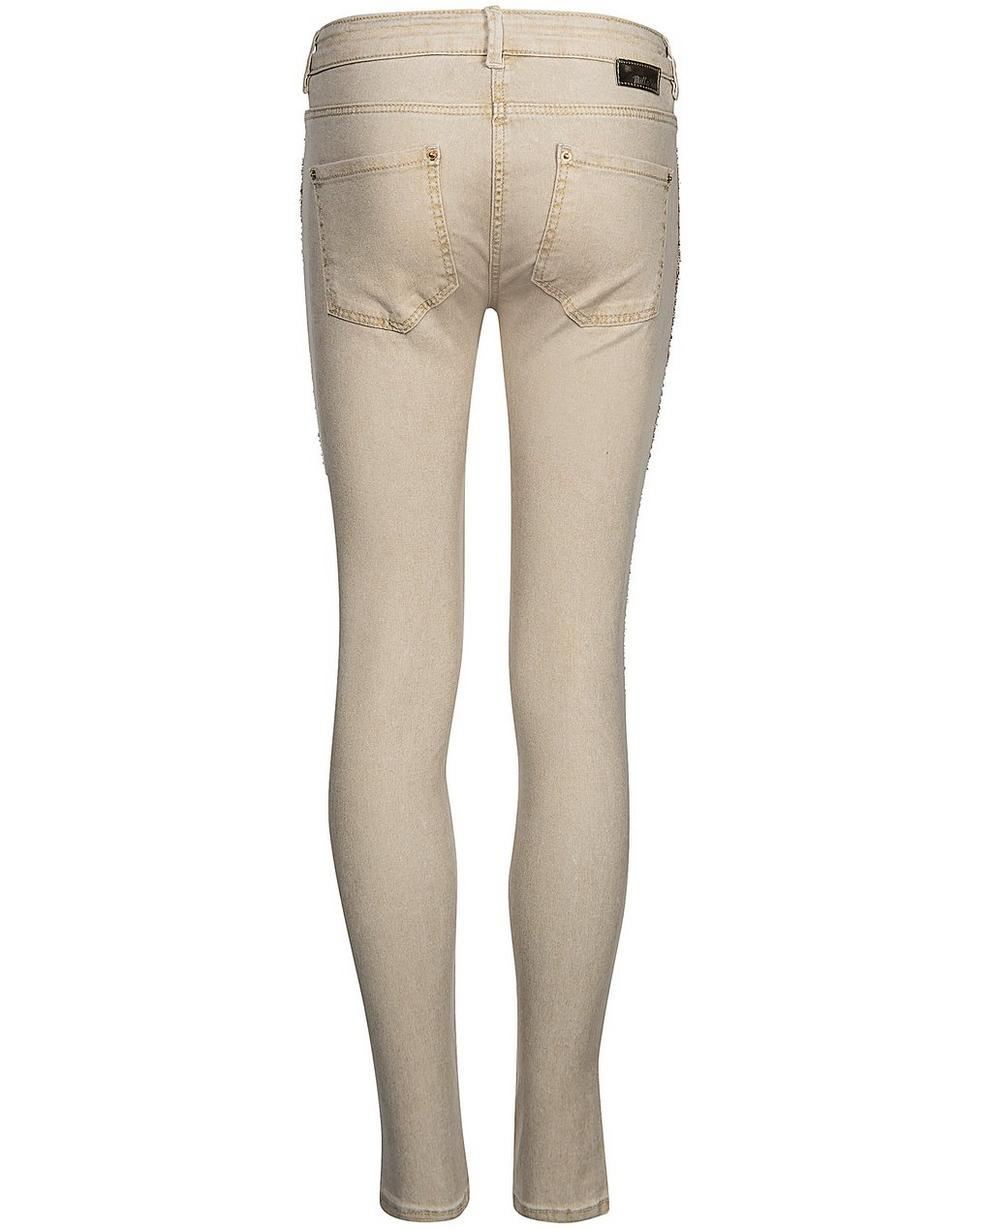 Hosen - Sand - Jeans mit Glitzerprint